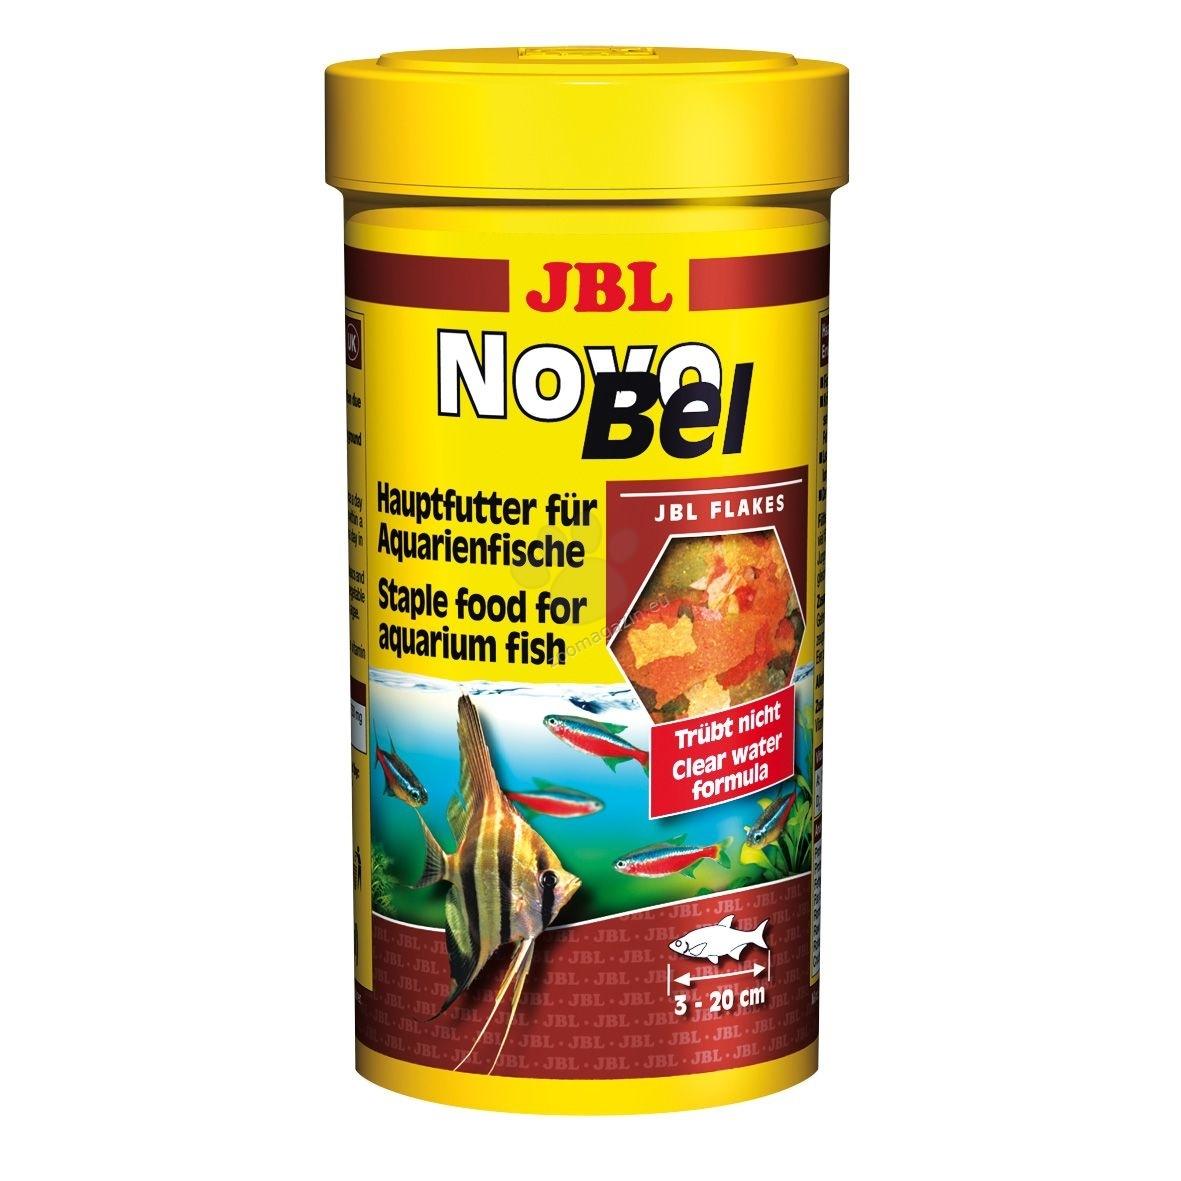 JBL NovoBel - βασική τροφή για όλα τα διακοσμητικά ψάρια - 250 ml